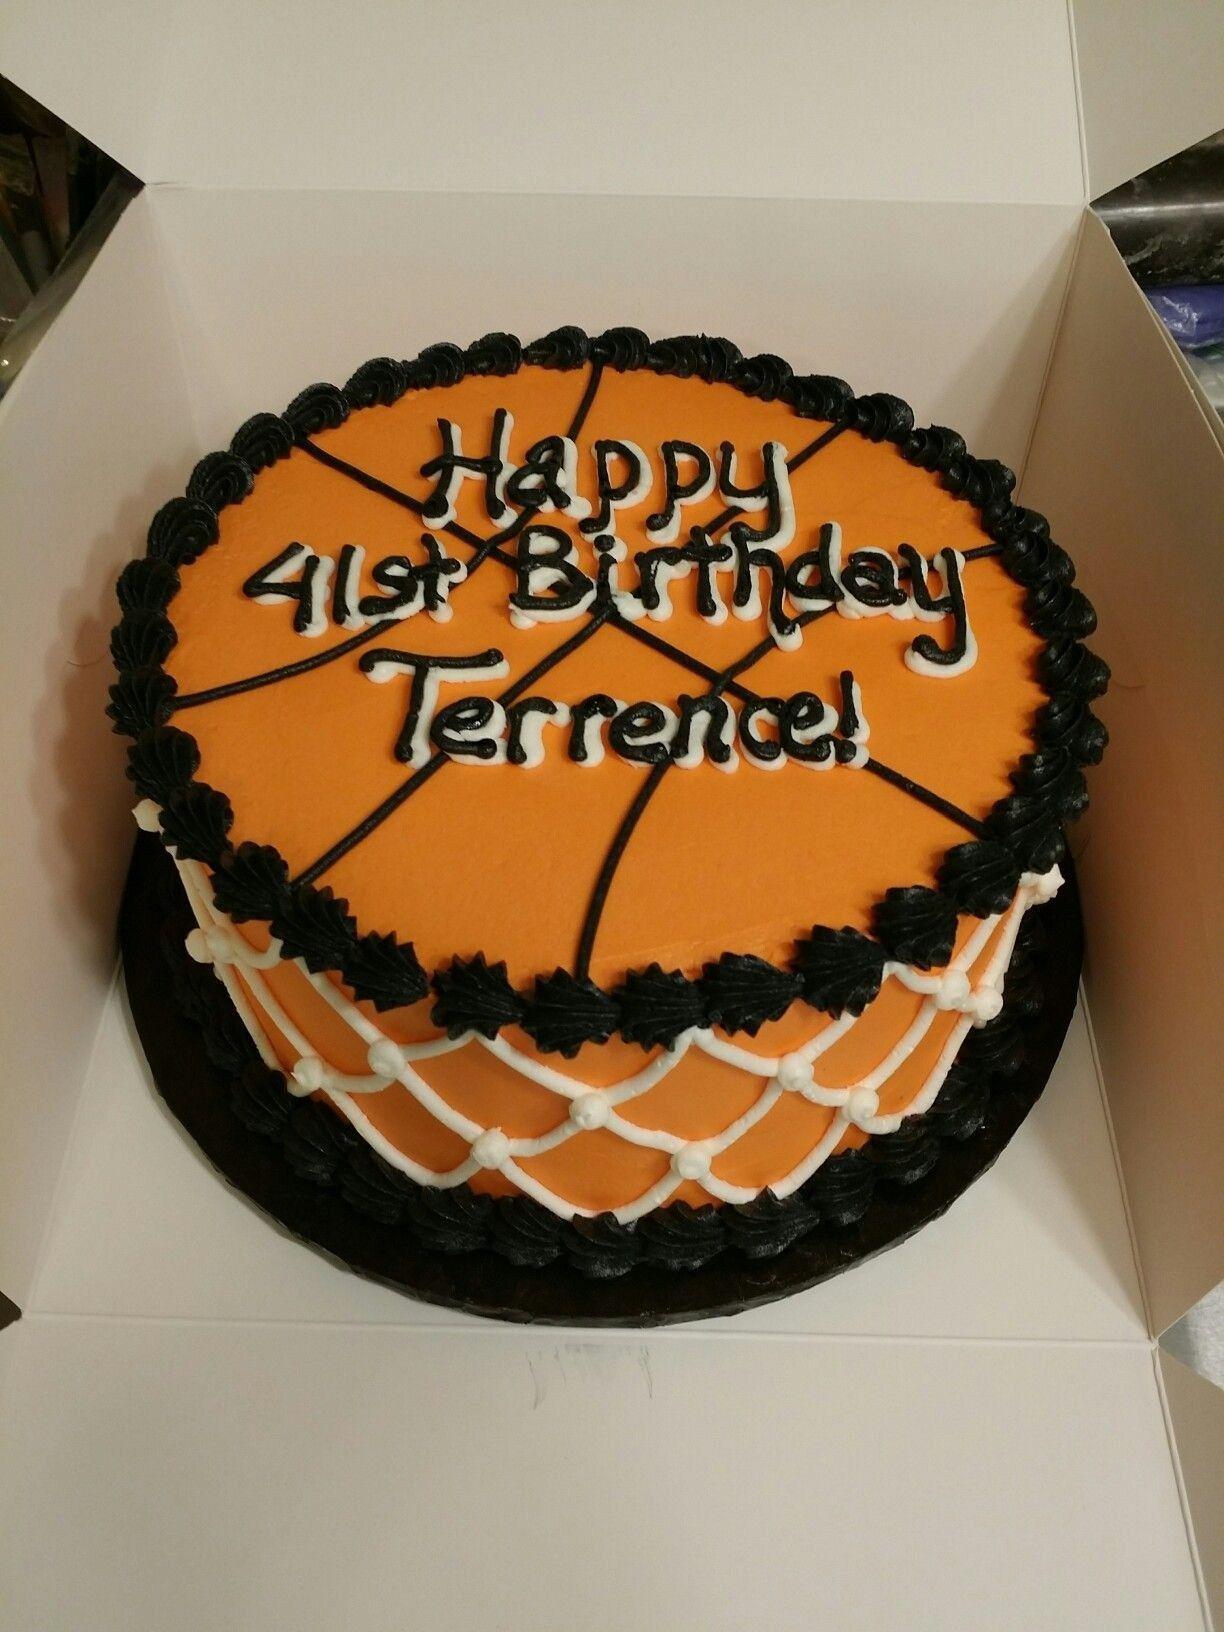 Basketball Birthday Cakes Simple Basketball Birthday Cake Cakes Michelle Price Birthday Basketball Birthday Cake Birthday Cakes For Teens Round Birthday Cakes